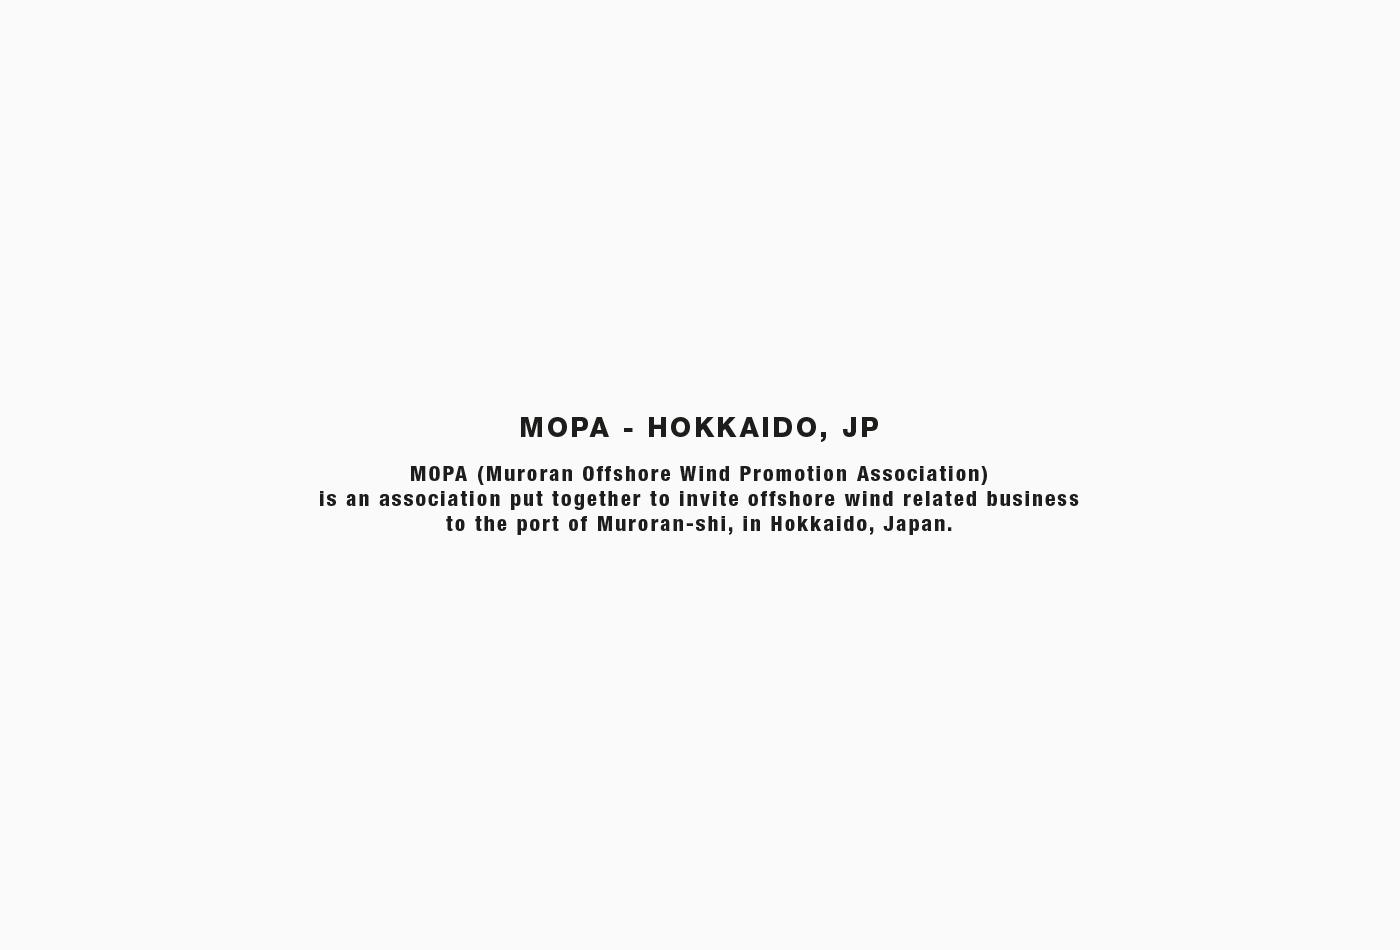 mopa-muroran-city-hokkaido-japan-branding-logo-vacaliebres-marks-trademarks-trademarks-japanese-signs-logos-branding-symbolprefecturelogoswind-nihon-wind-wind-turbines